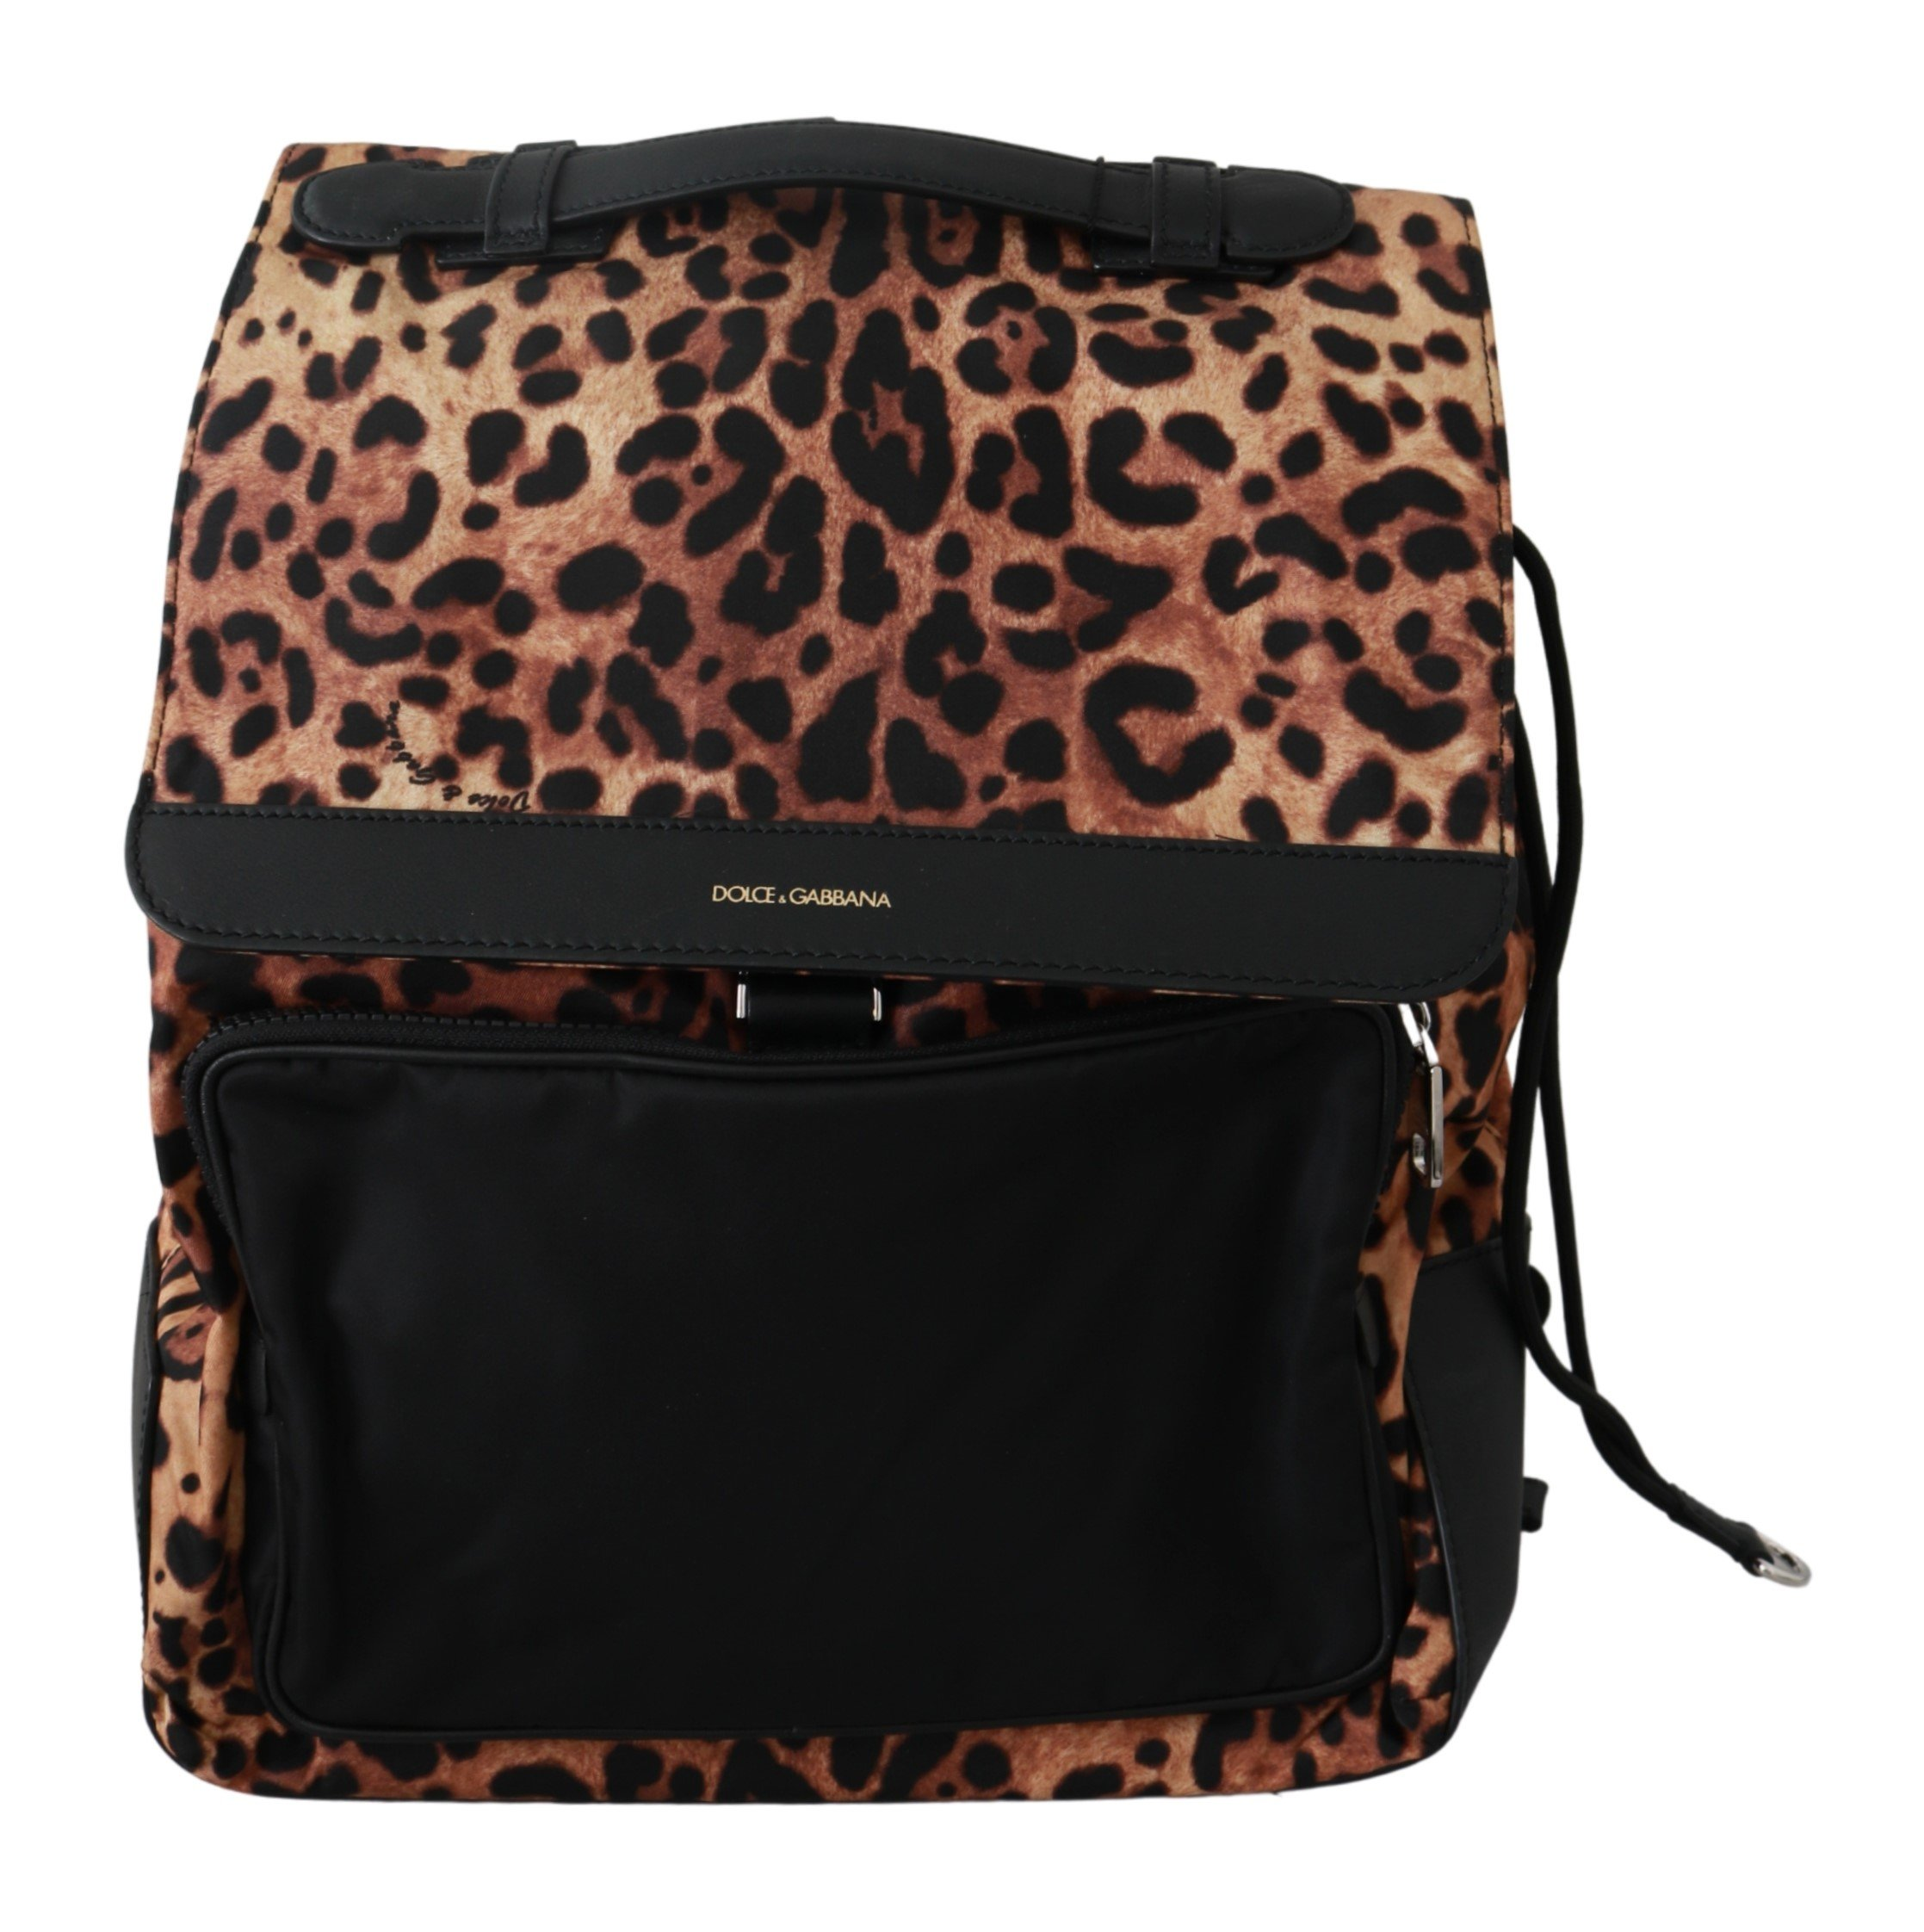 Dolce & Gabbana Men's Leopard Print School Leather Backpack Brown VAS9258